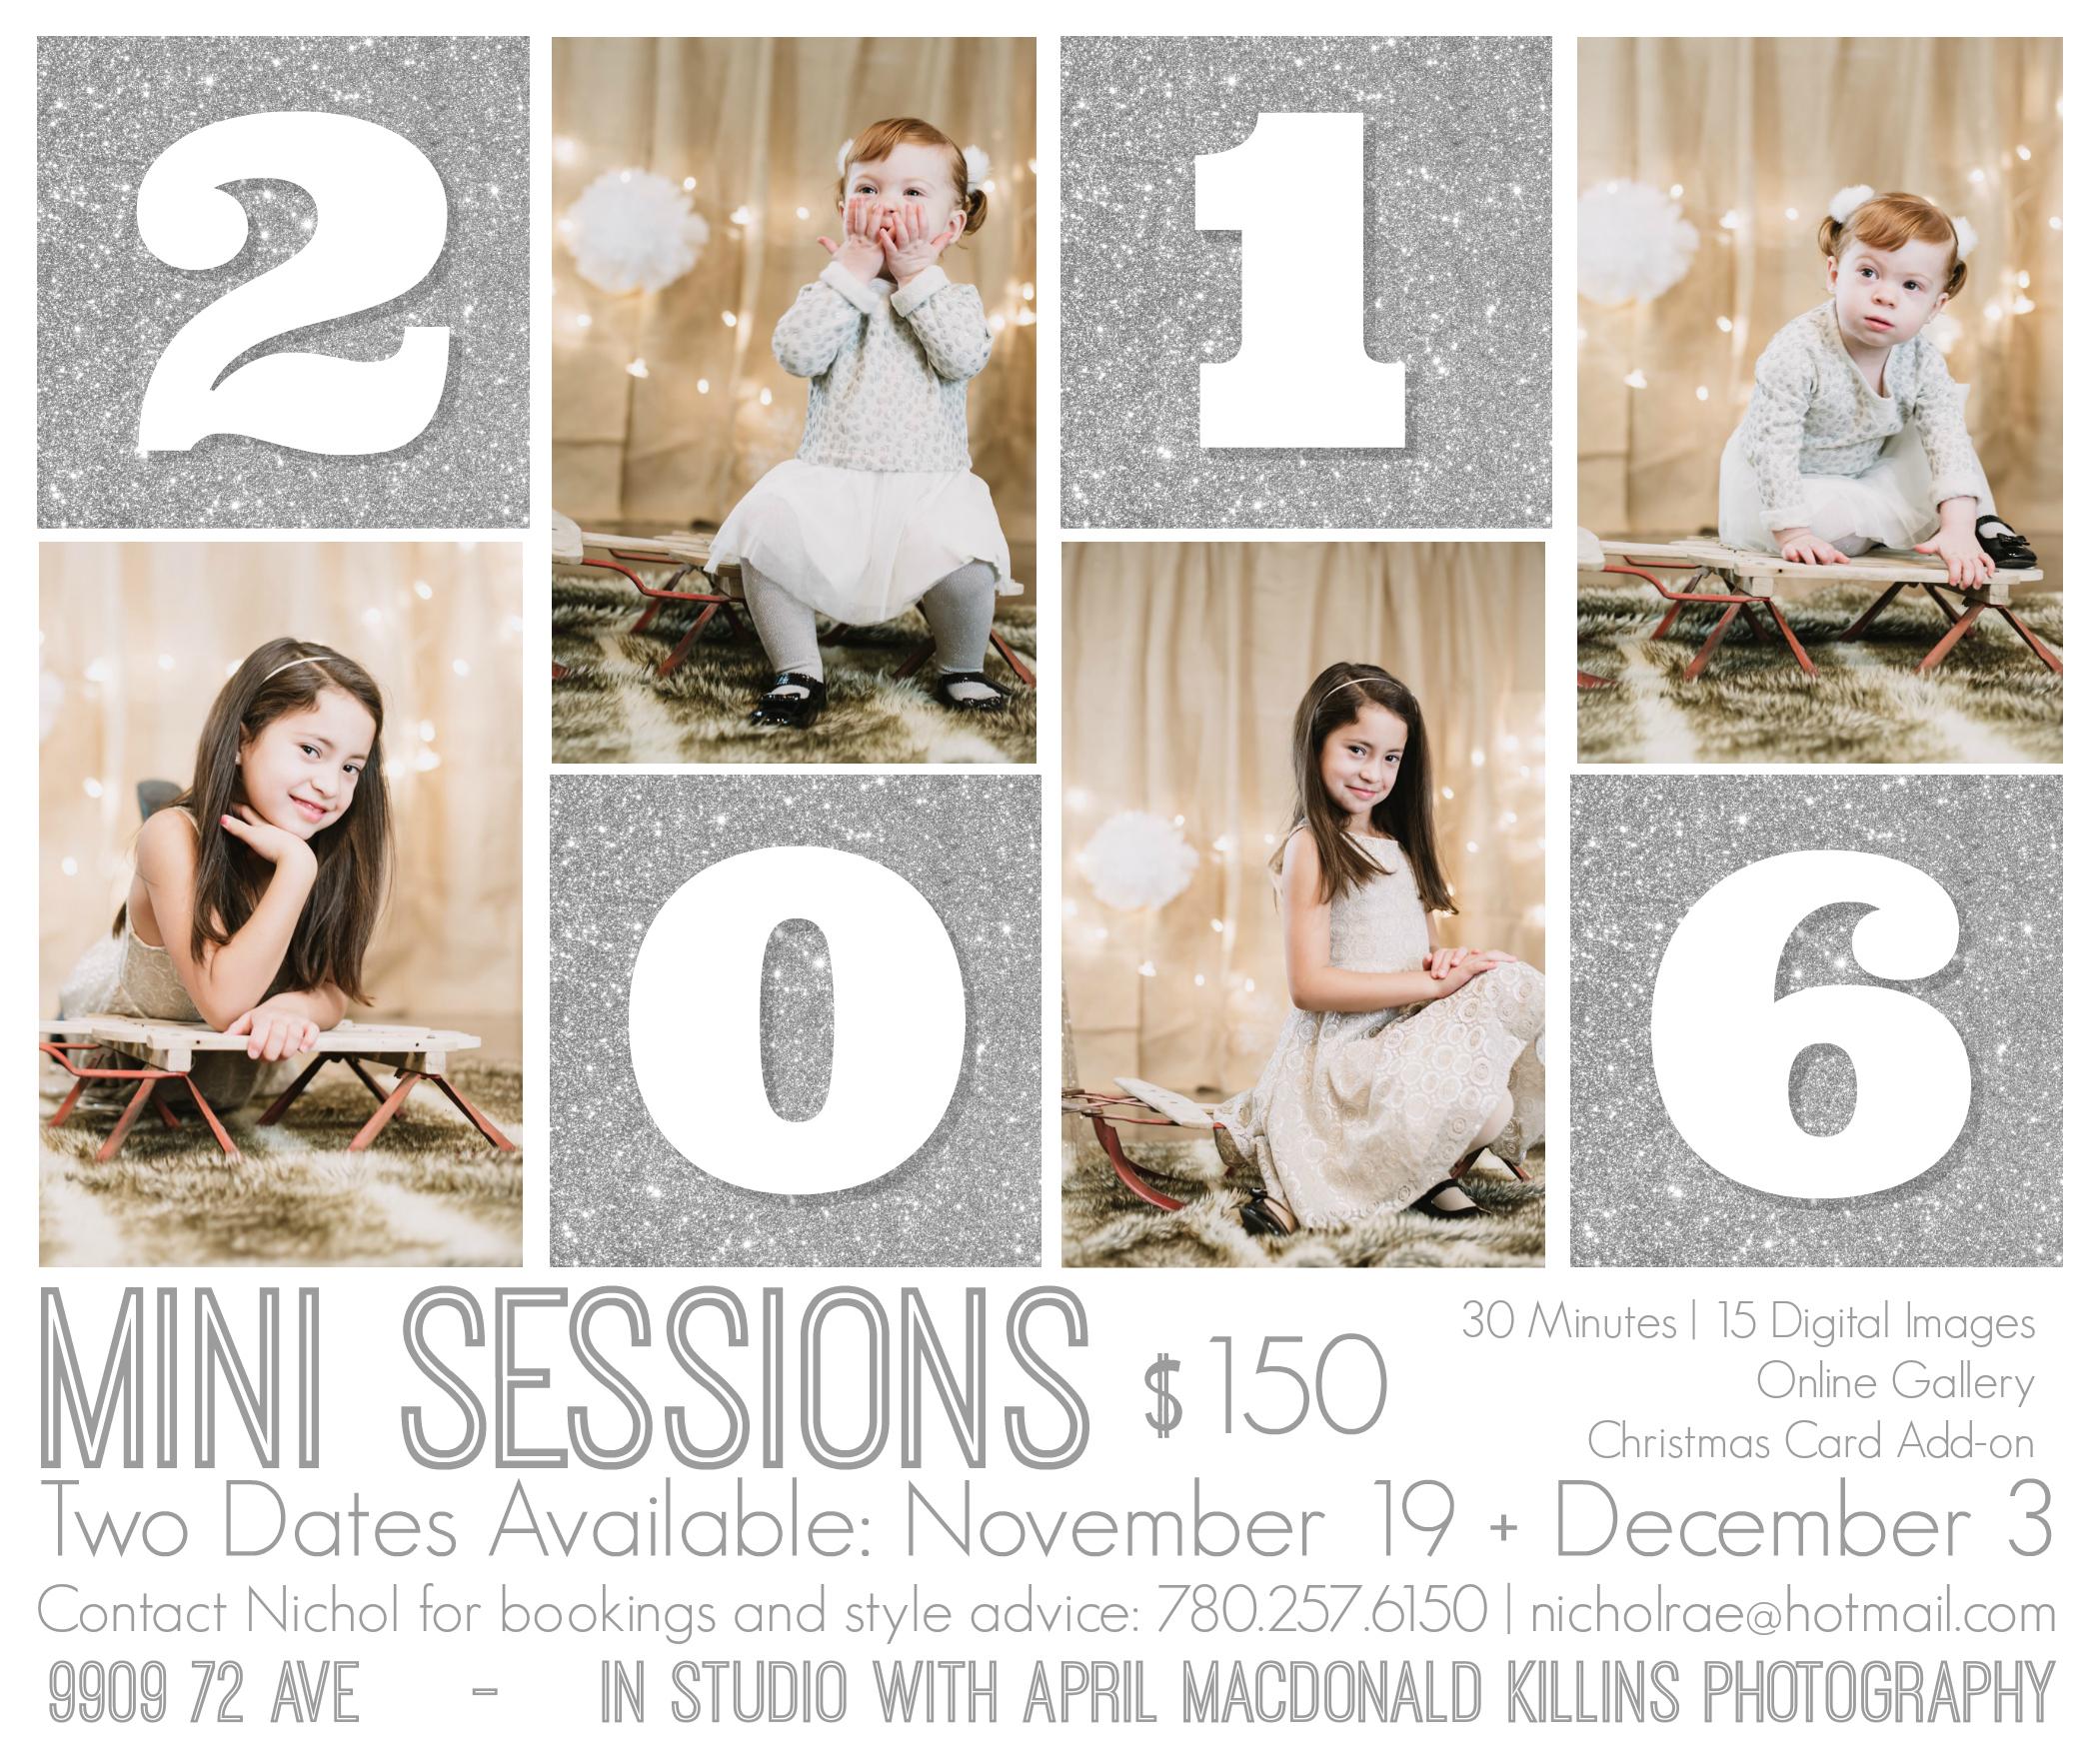 2016 Mini Sessions Ad.jpg